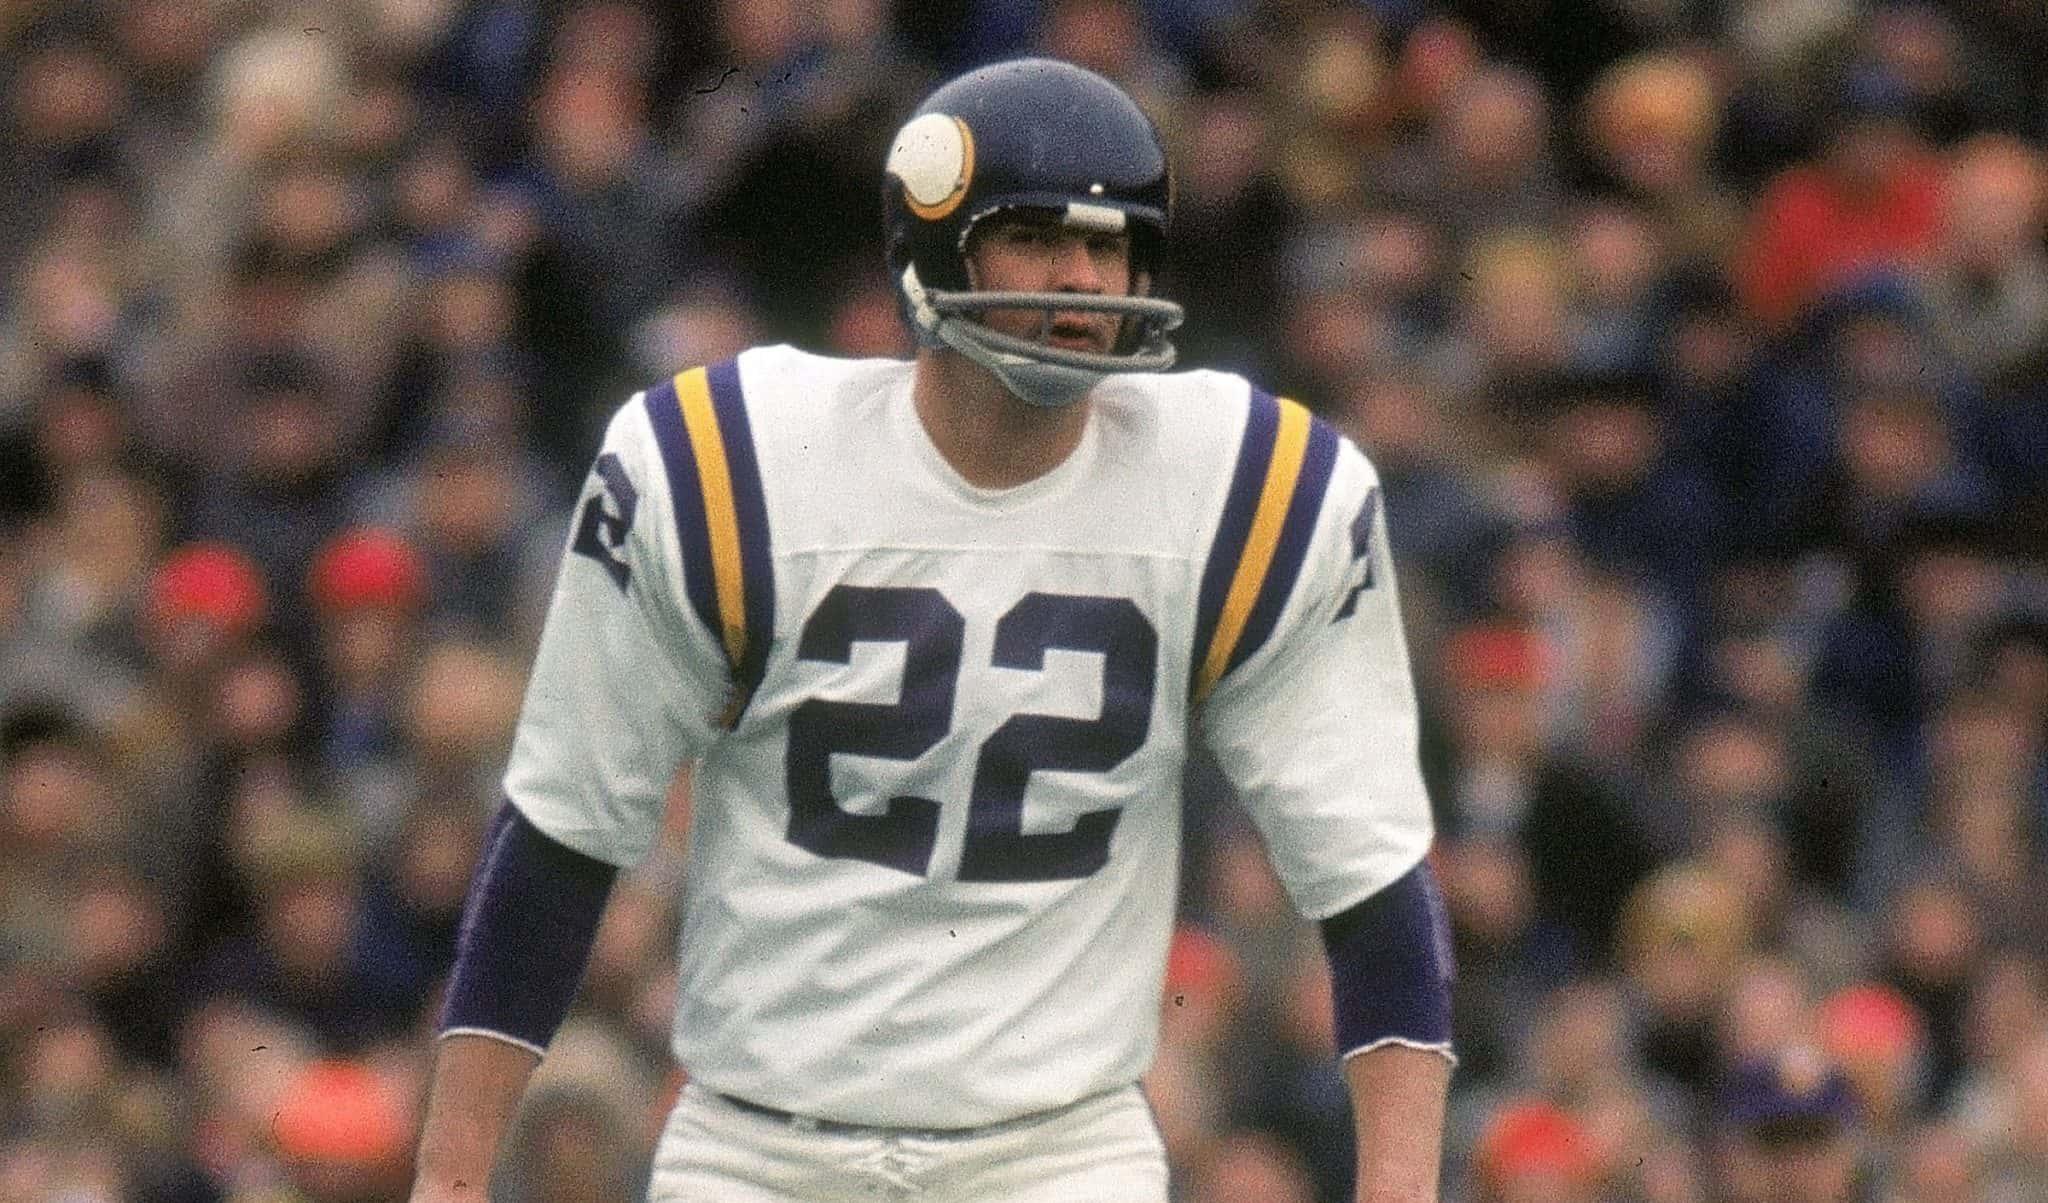 Paul Krause — Iowa (Big Ten) (1960-1963)